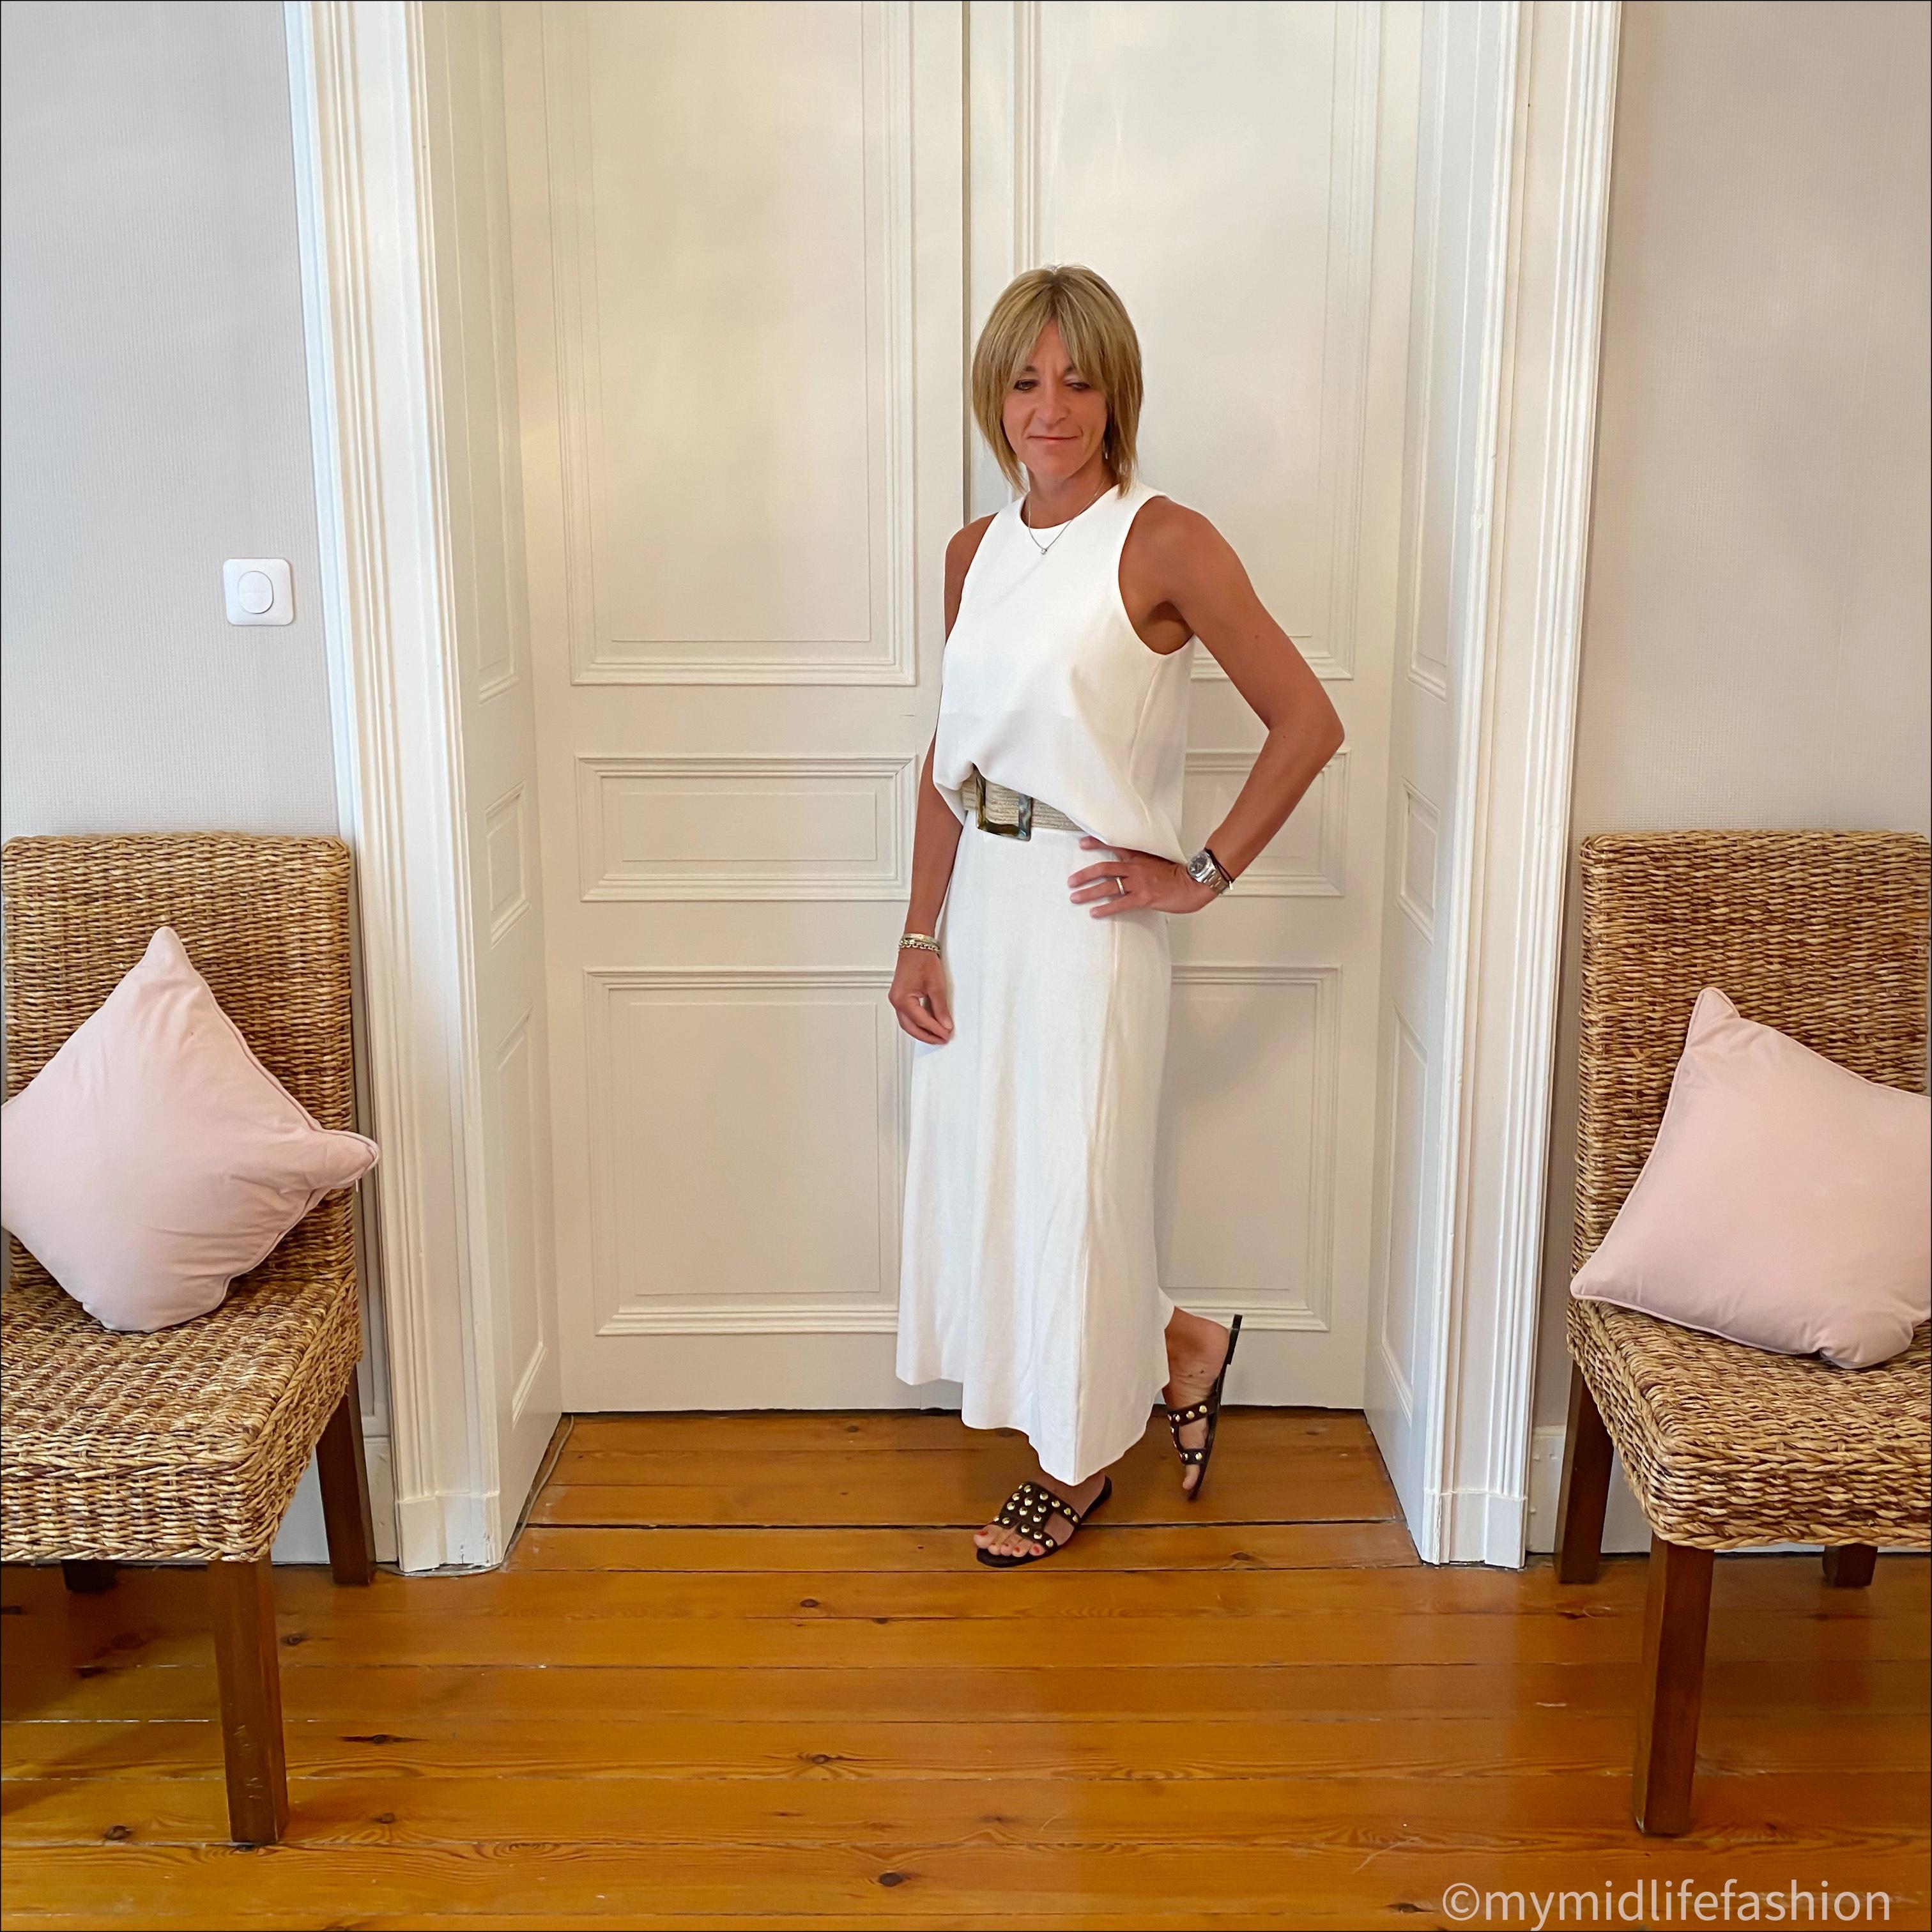 my midlife fashion, zara tank top, zara knitted midi skirt, zara jute belt, zara studded leather sliders